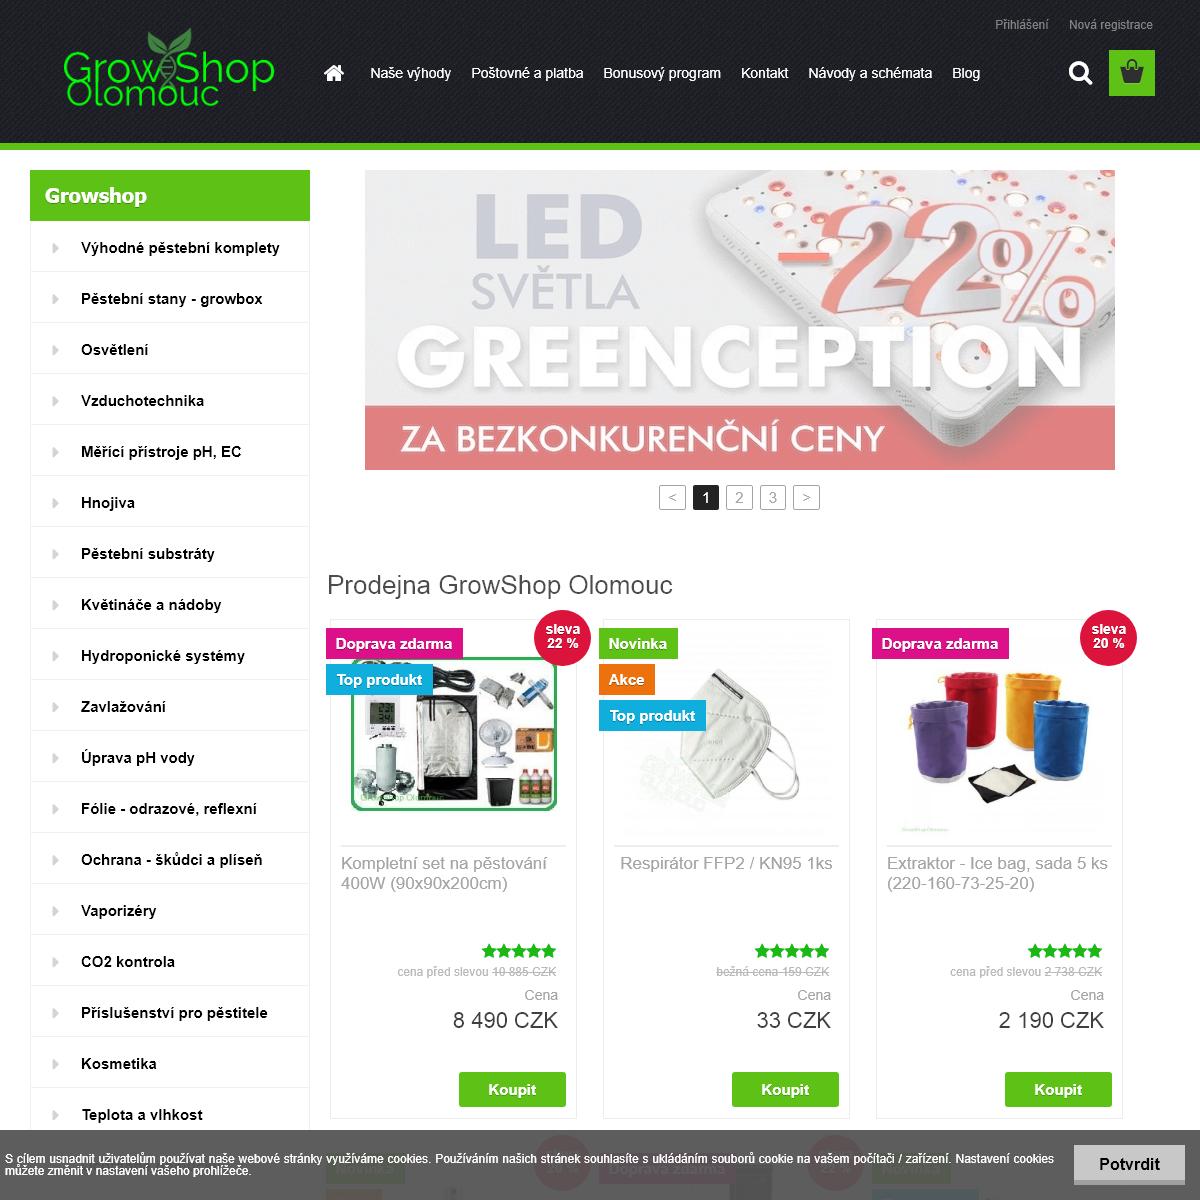 GrowShop Olomouc - Akce a slevy až 33-